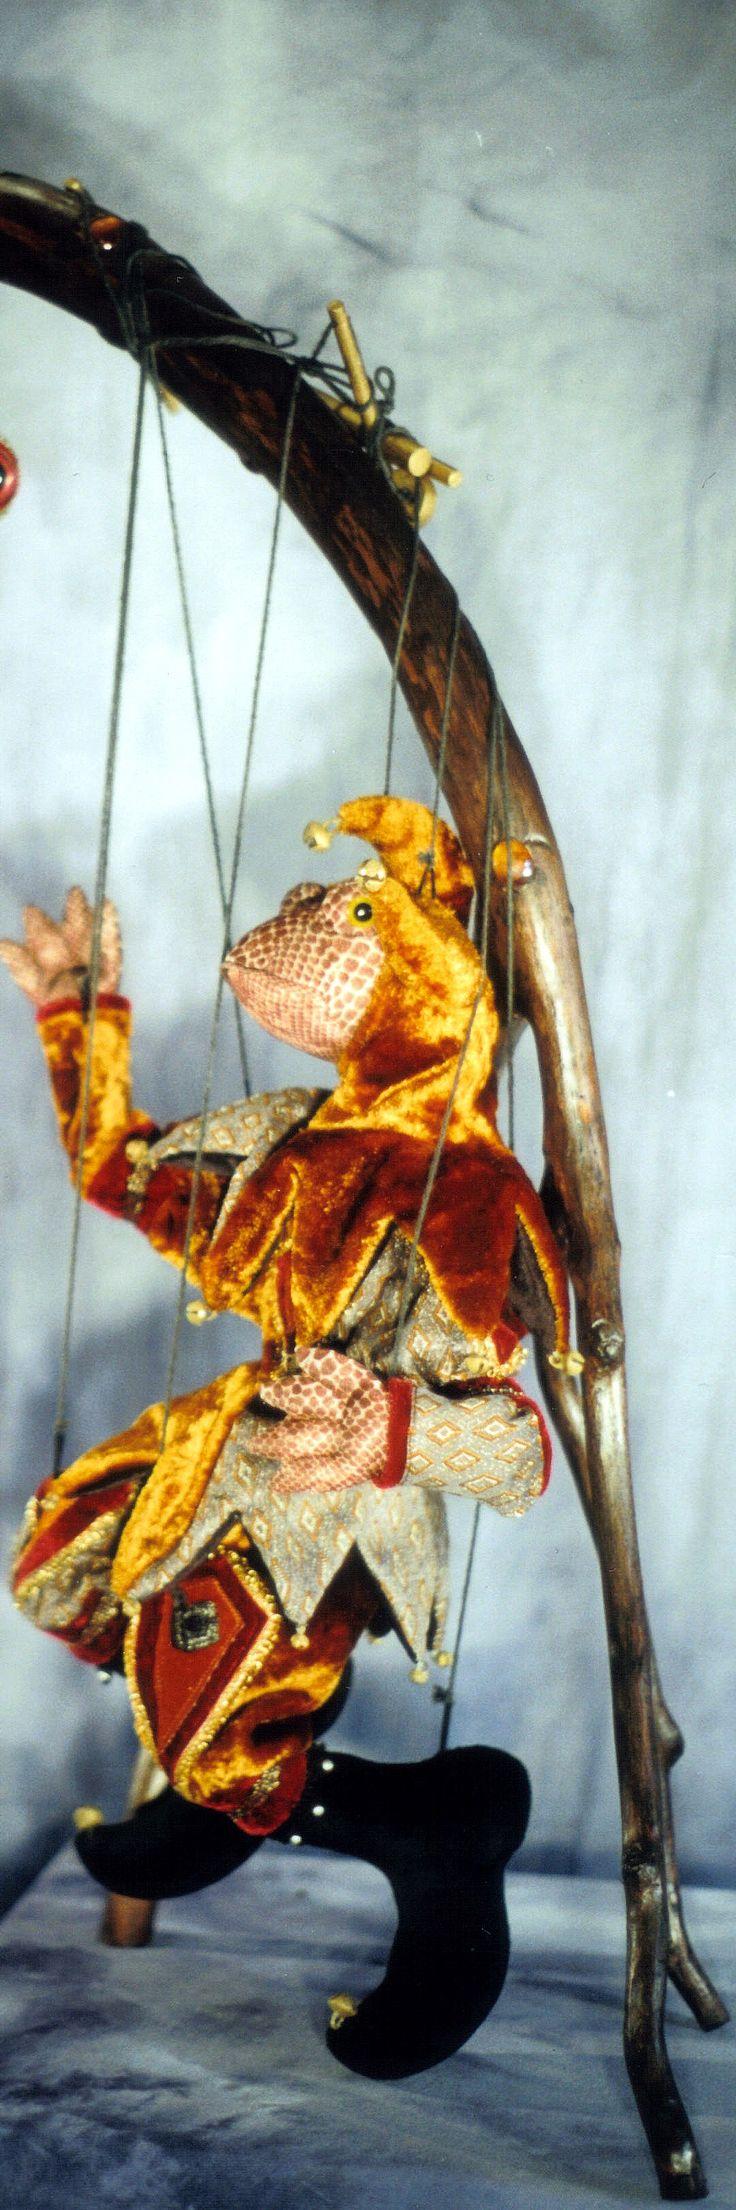 marionnette grenouille a fil 350,00 CA$